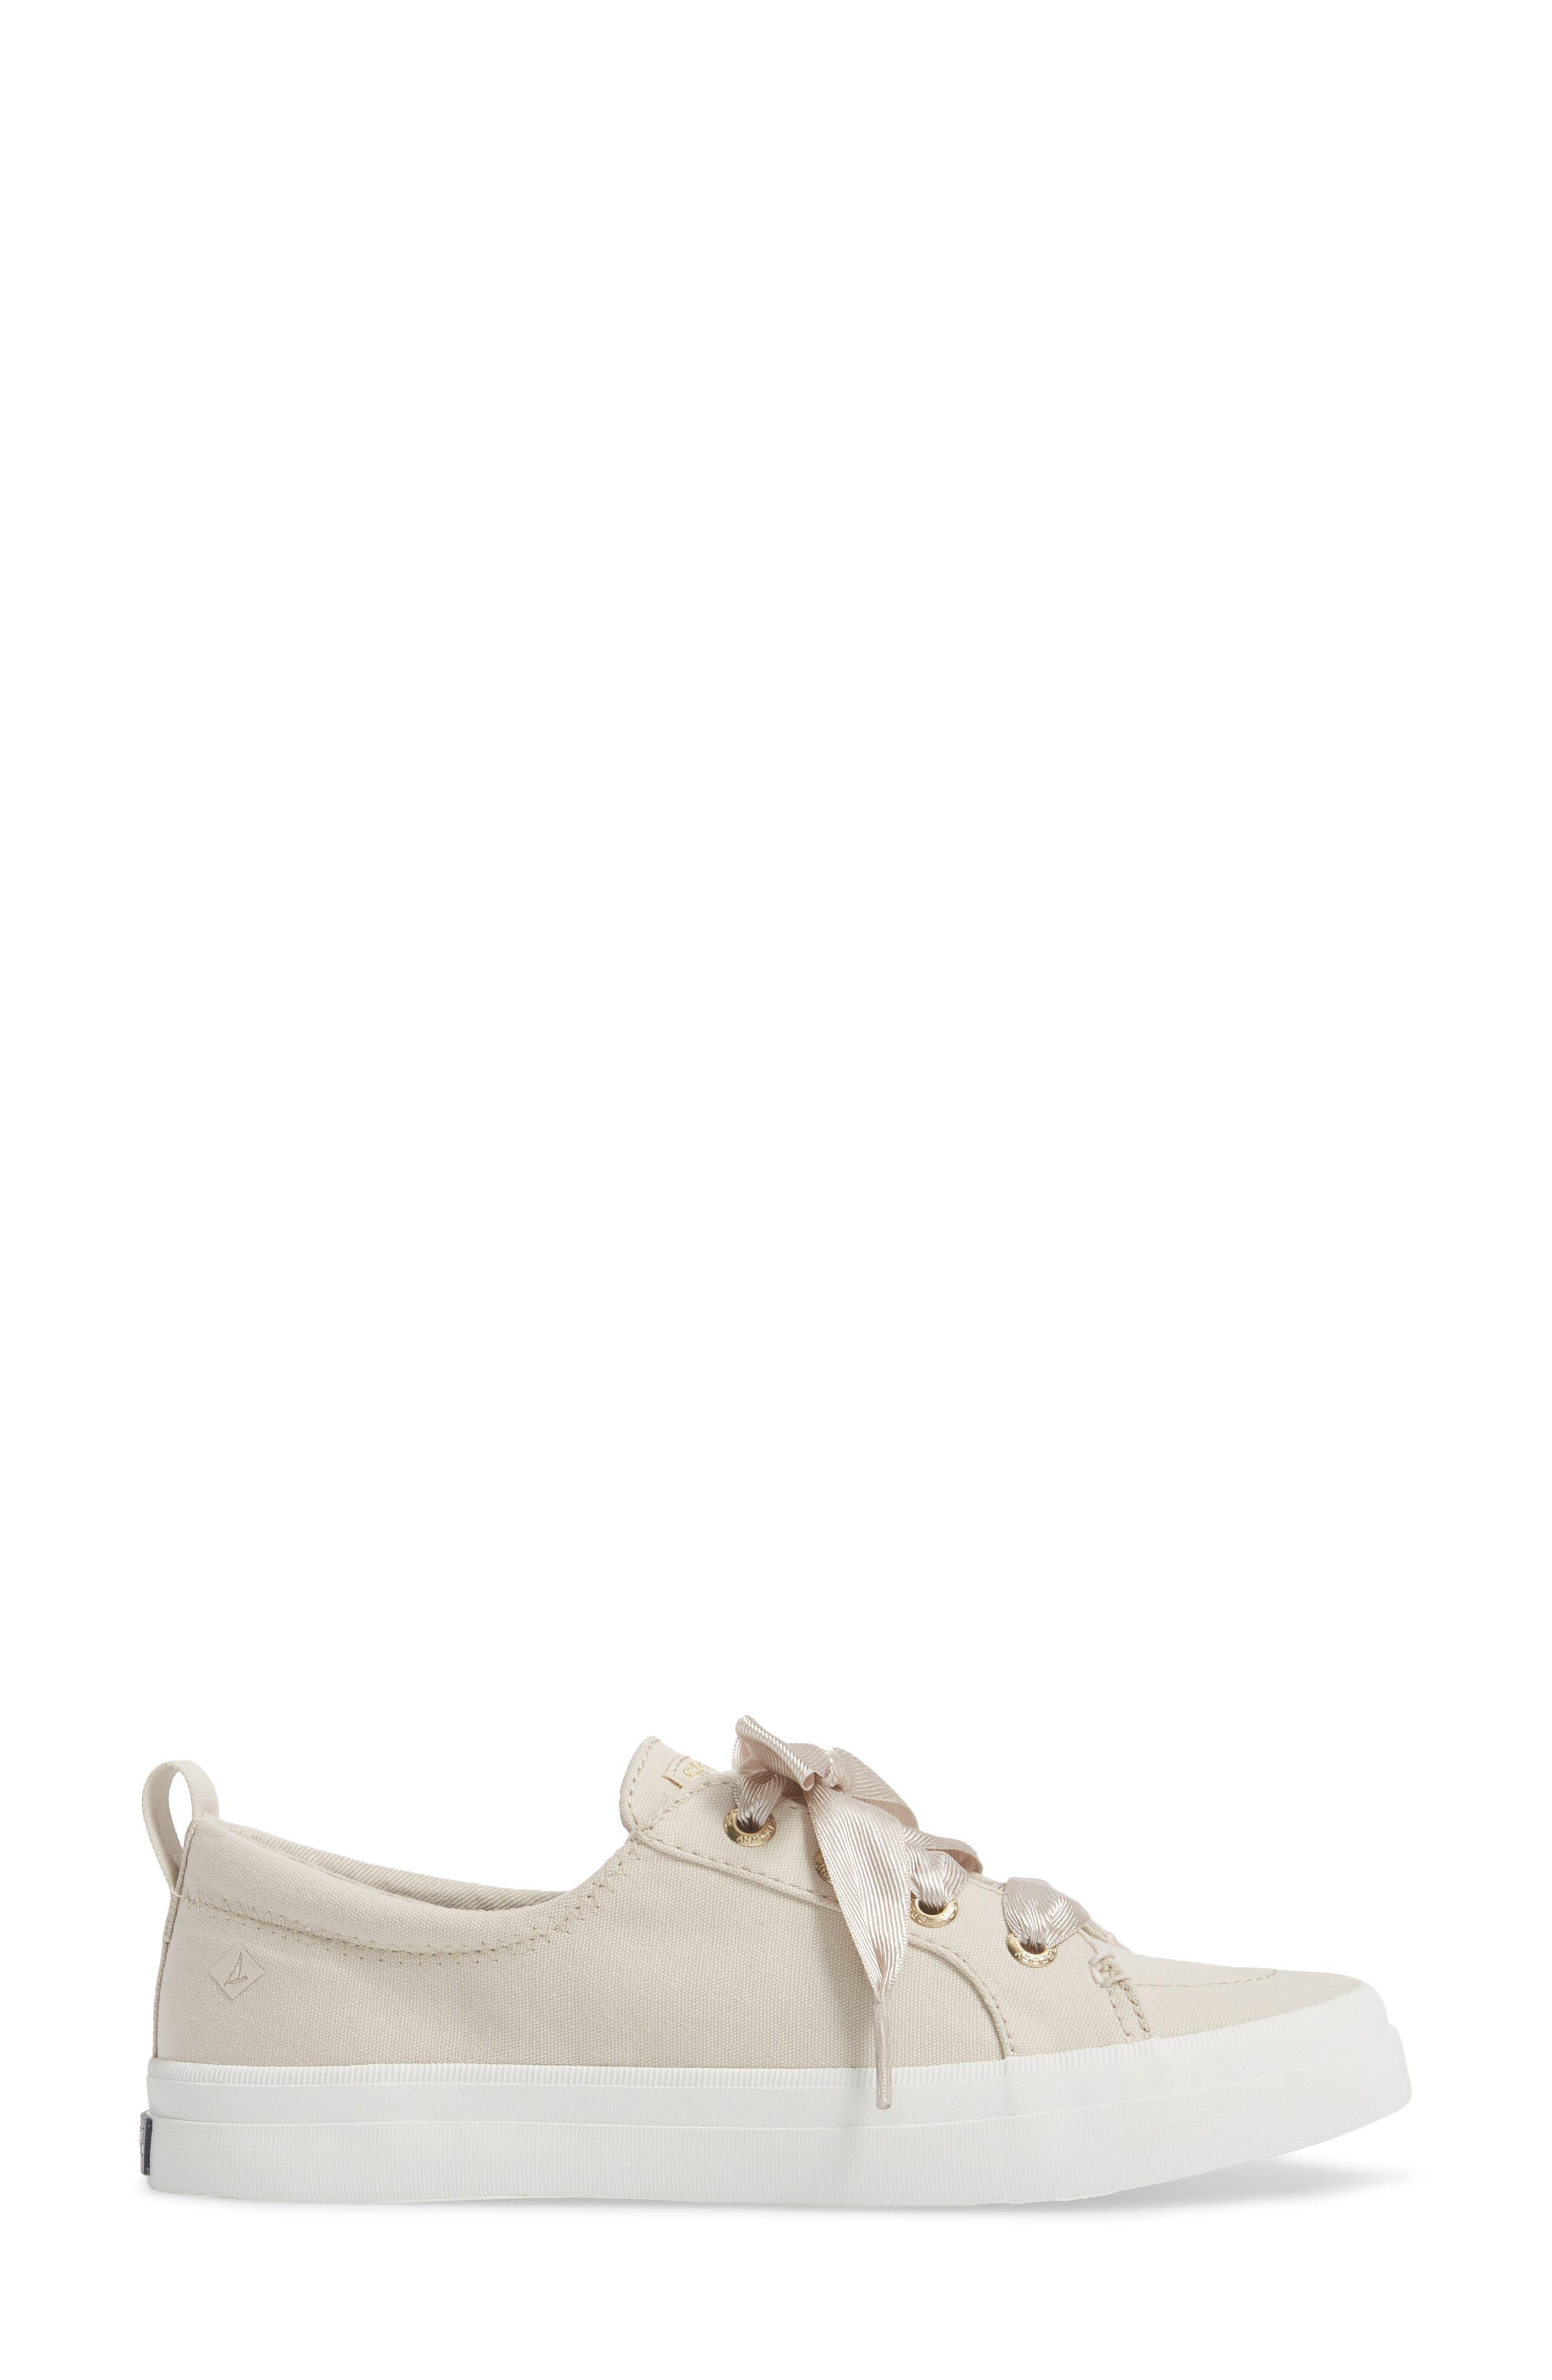 Crest Vibe Satin Lace Sneaker,                             Alternate thumbnail 8, color,